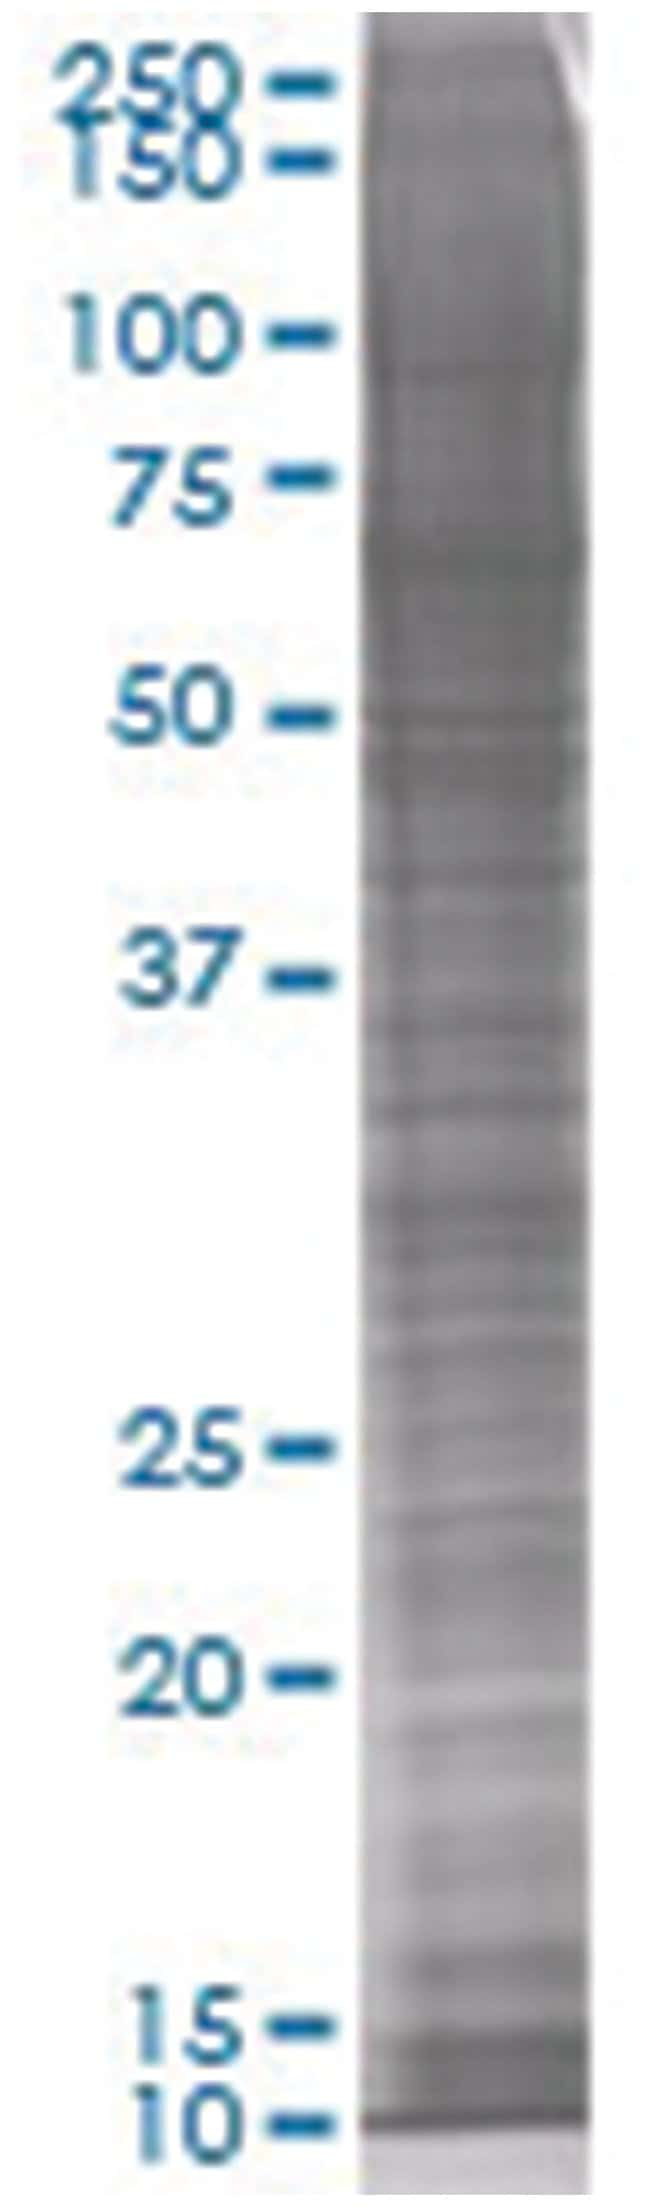 FANCA 293T Cell Overexpression Lysate (Denatured), Abnova 100μL:Protein